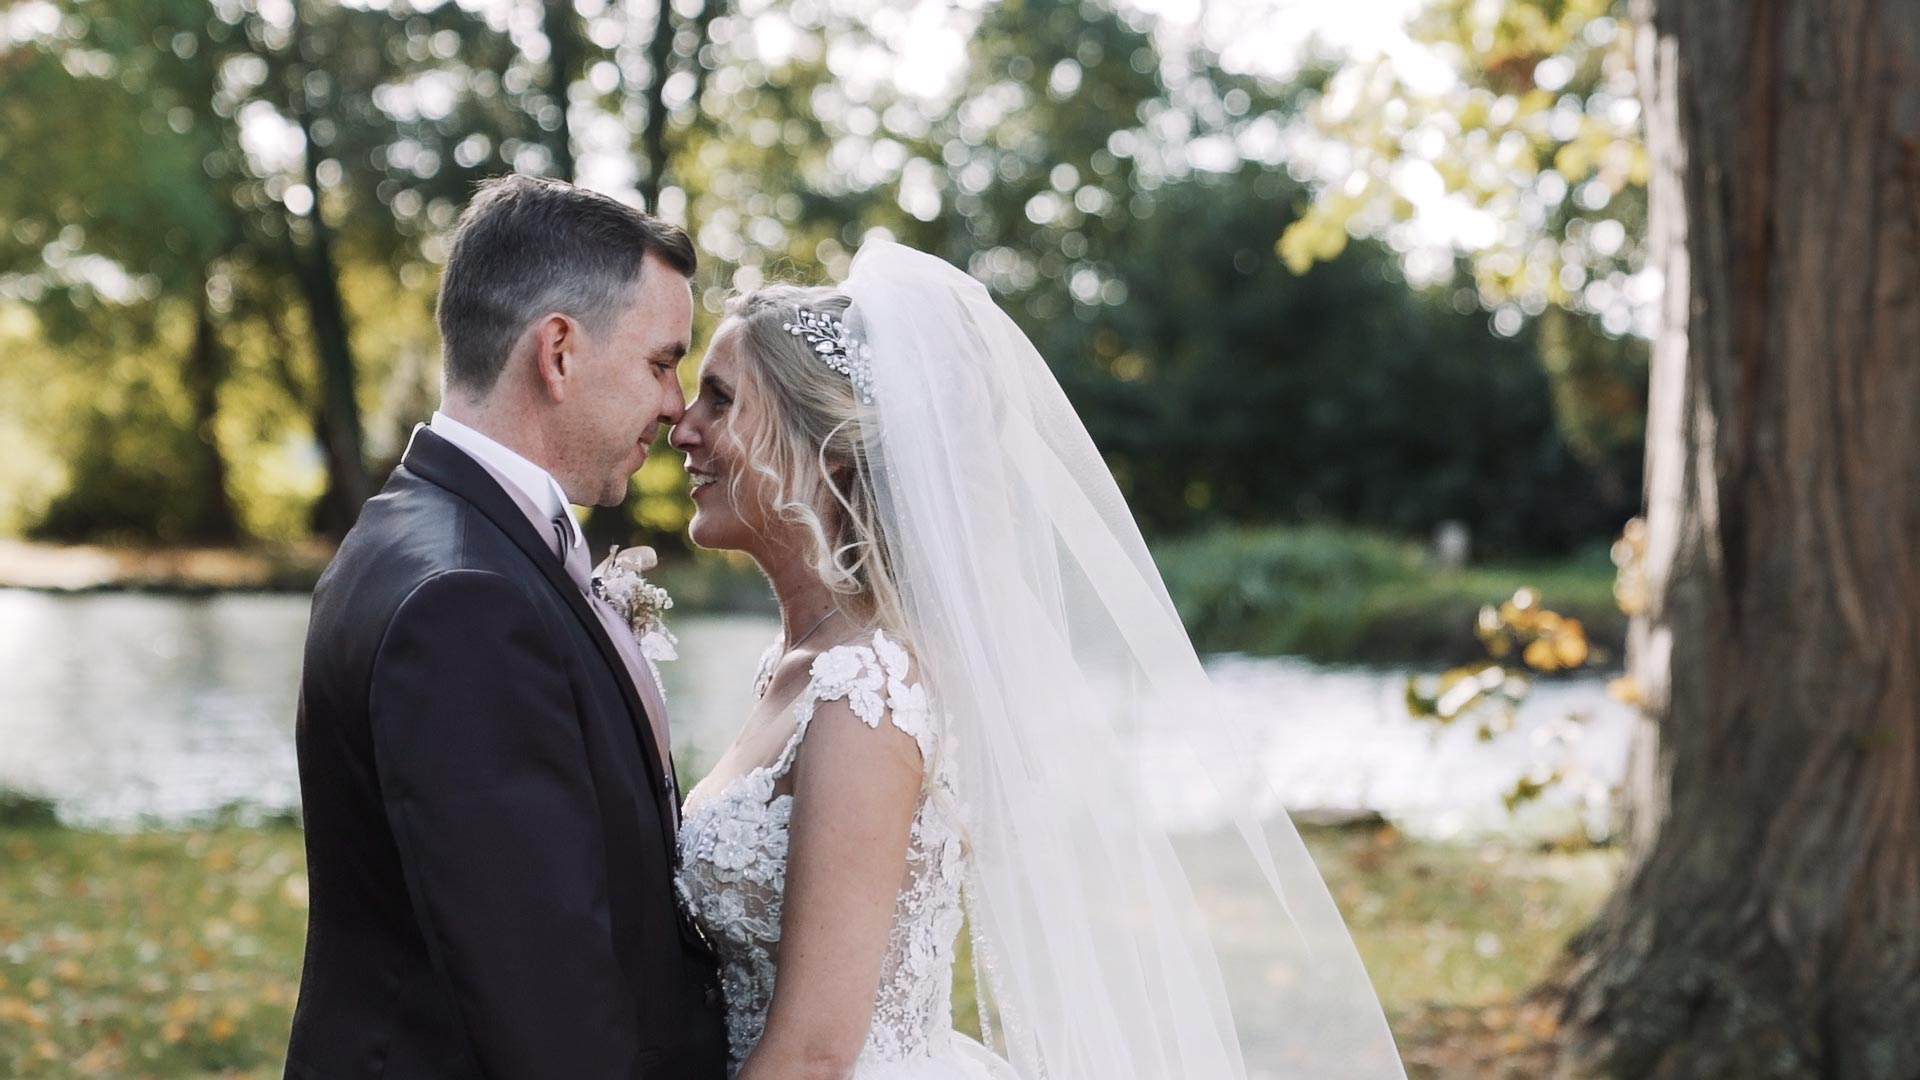 Pascal & Jenny Hochzeitsfilm Schloss Vettelhoven Videograf Hochzeit Filmemacher 013